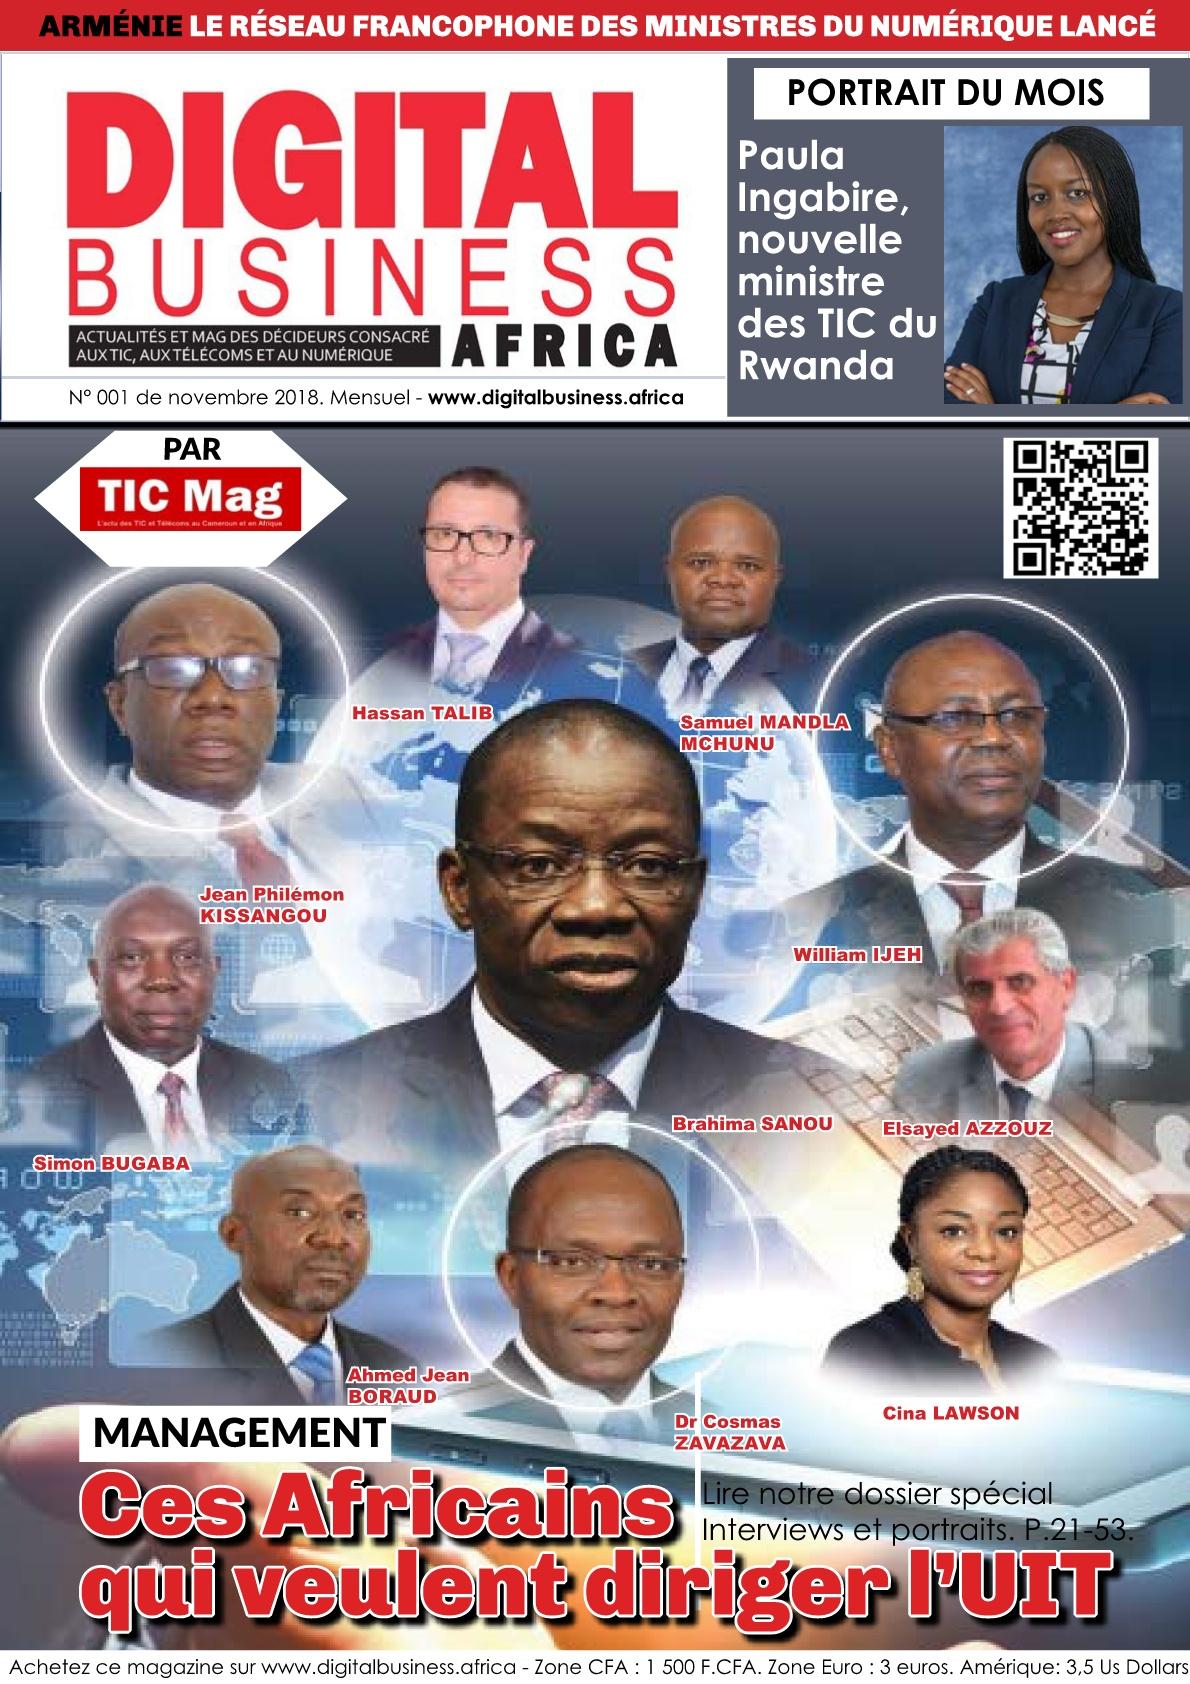 DIGITAL BUSINESS AFRICA - 14/11/2018